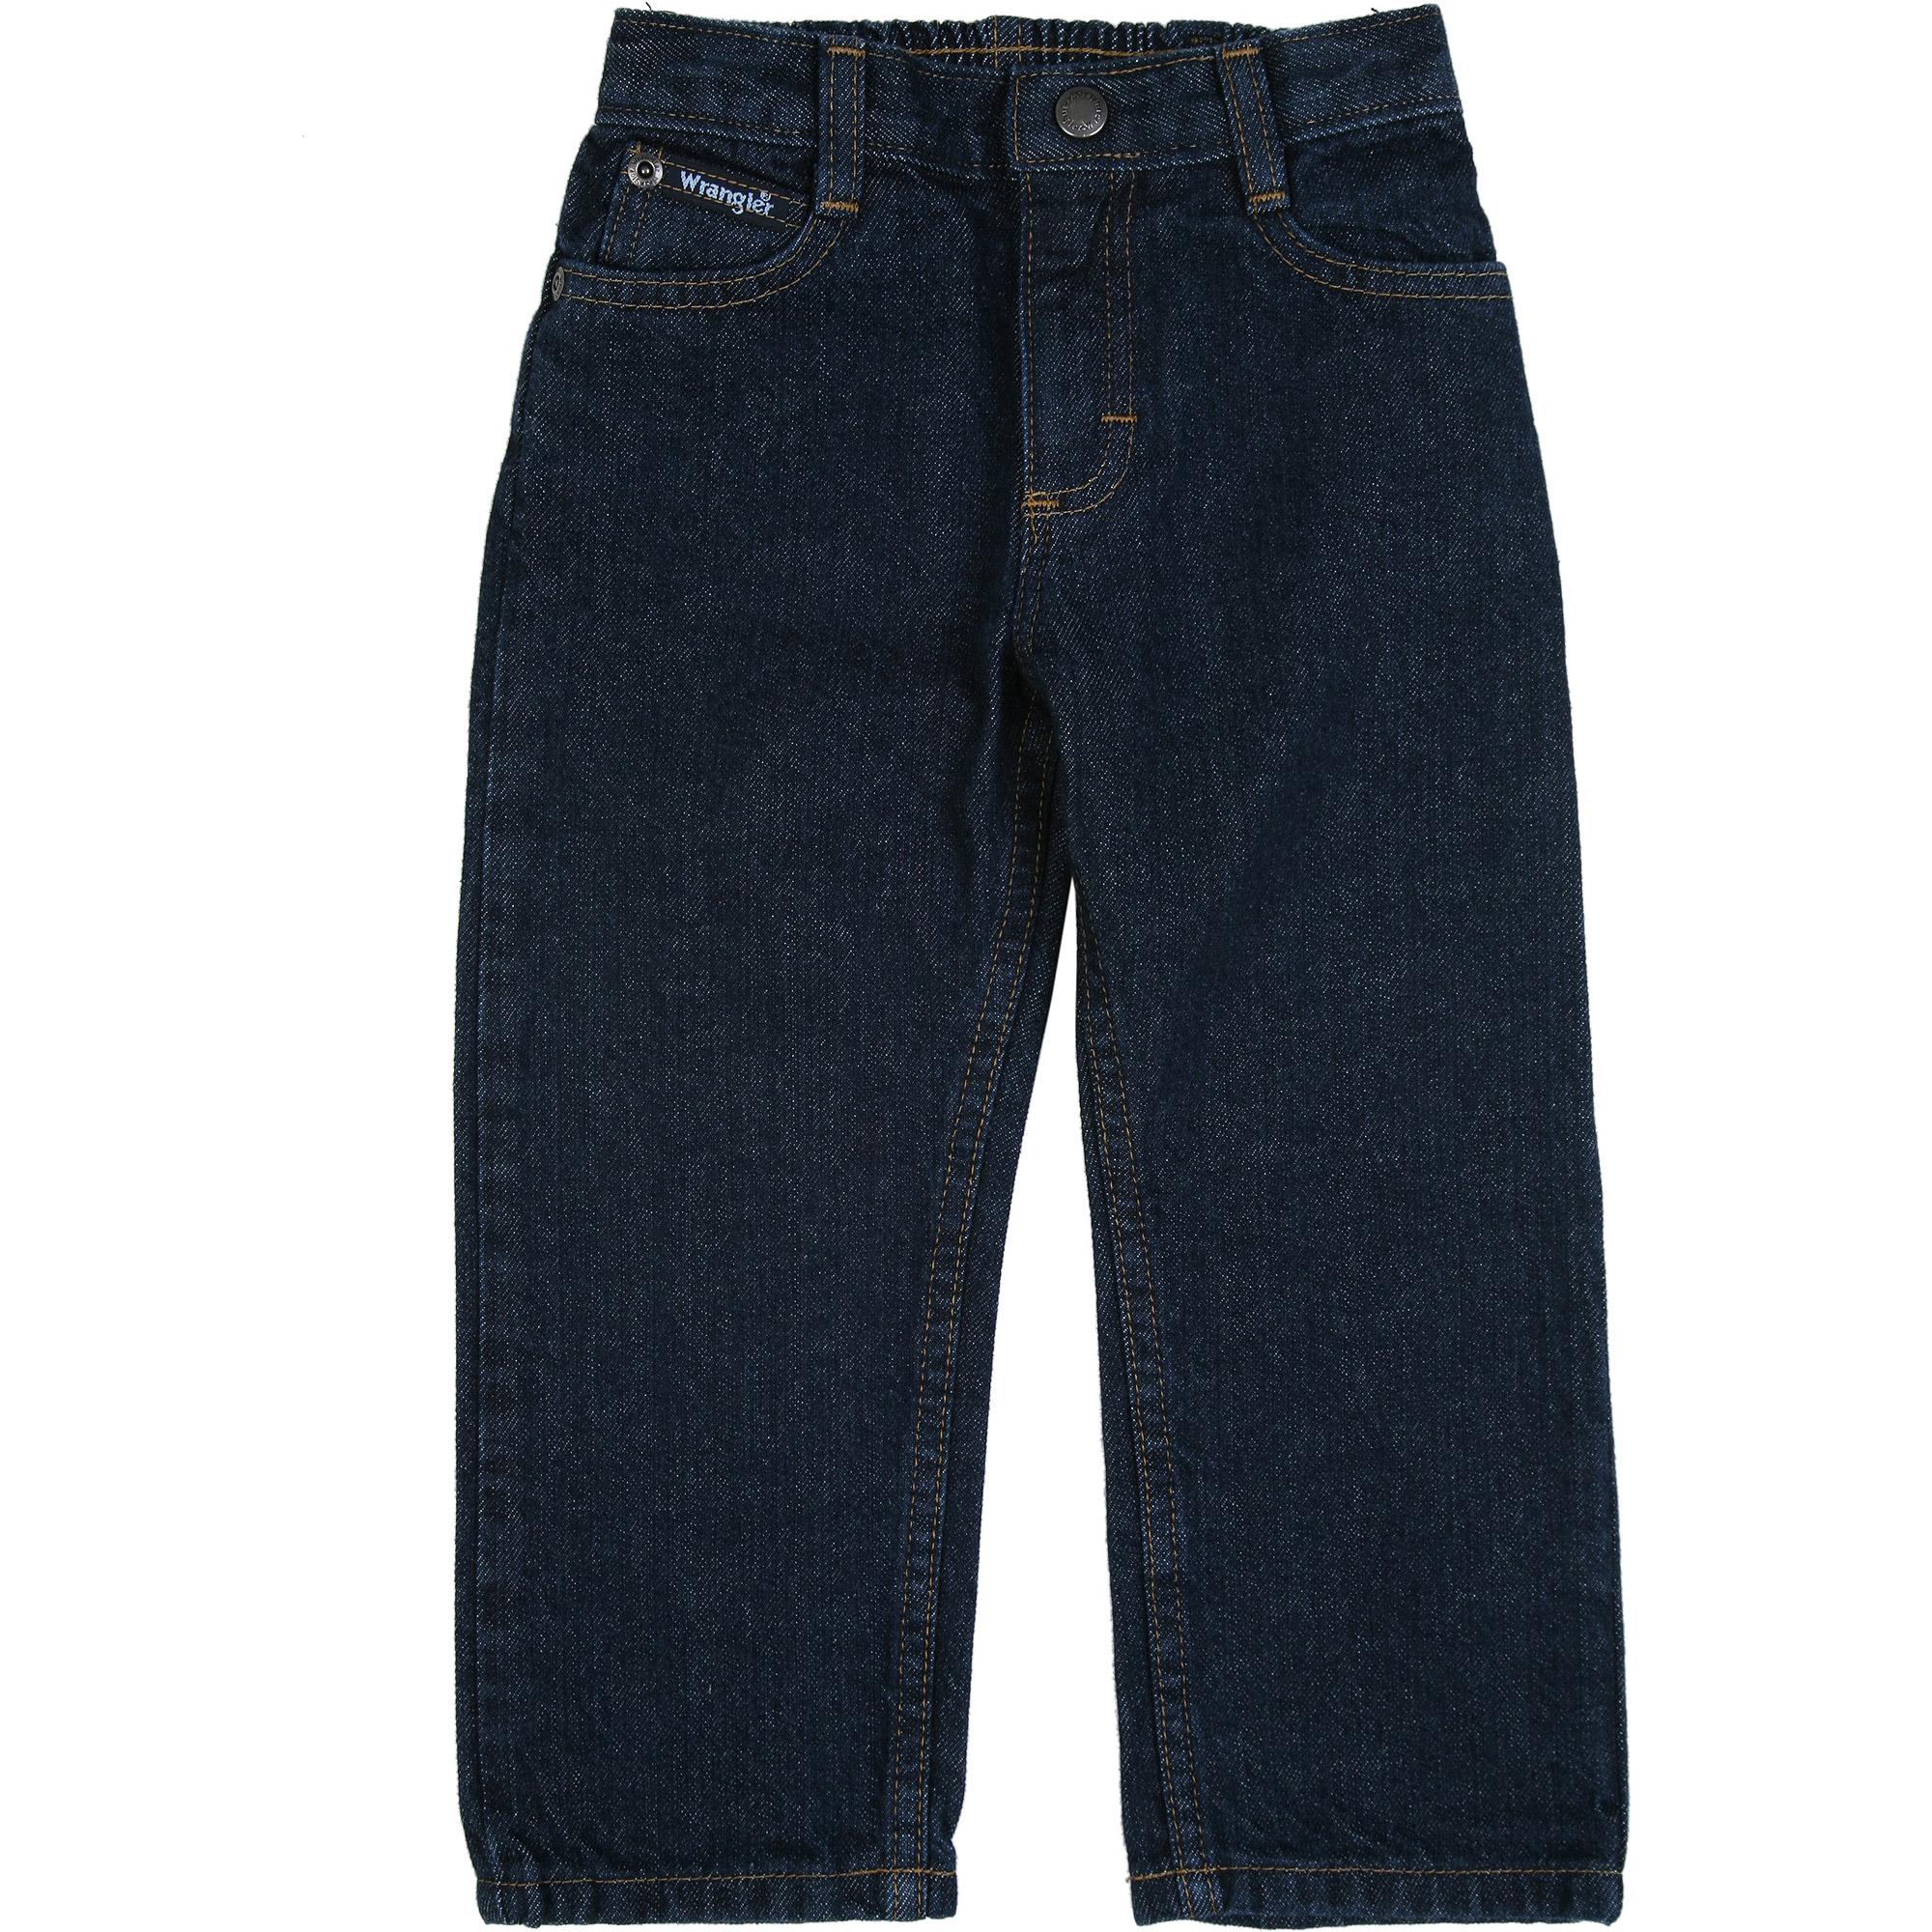 Wrangler - Baby Boys' 5-Pocket Jeans